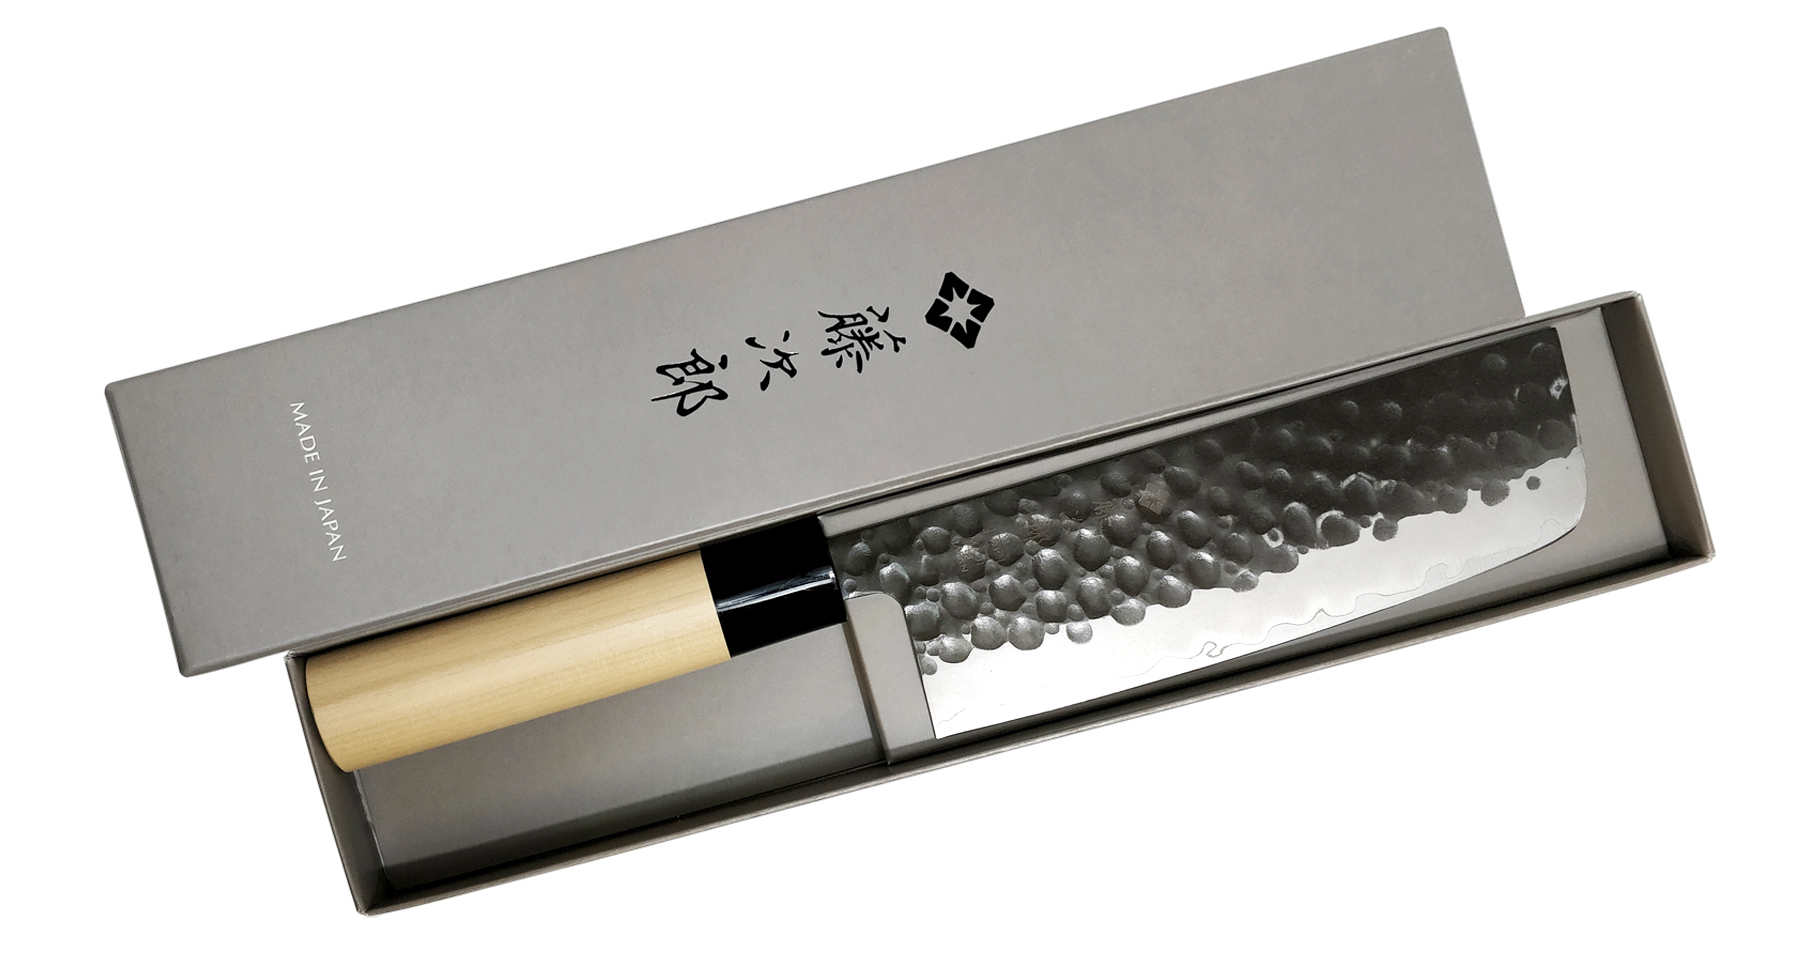 Фото 5 - Кухонный нож для овощей Накири, Hammered Finish, TOJIRO, F-1113, сталь VG-10, в картонной коробке